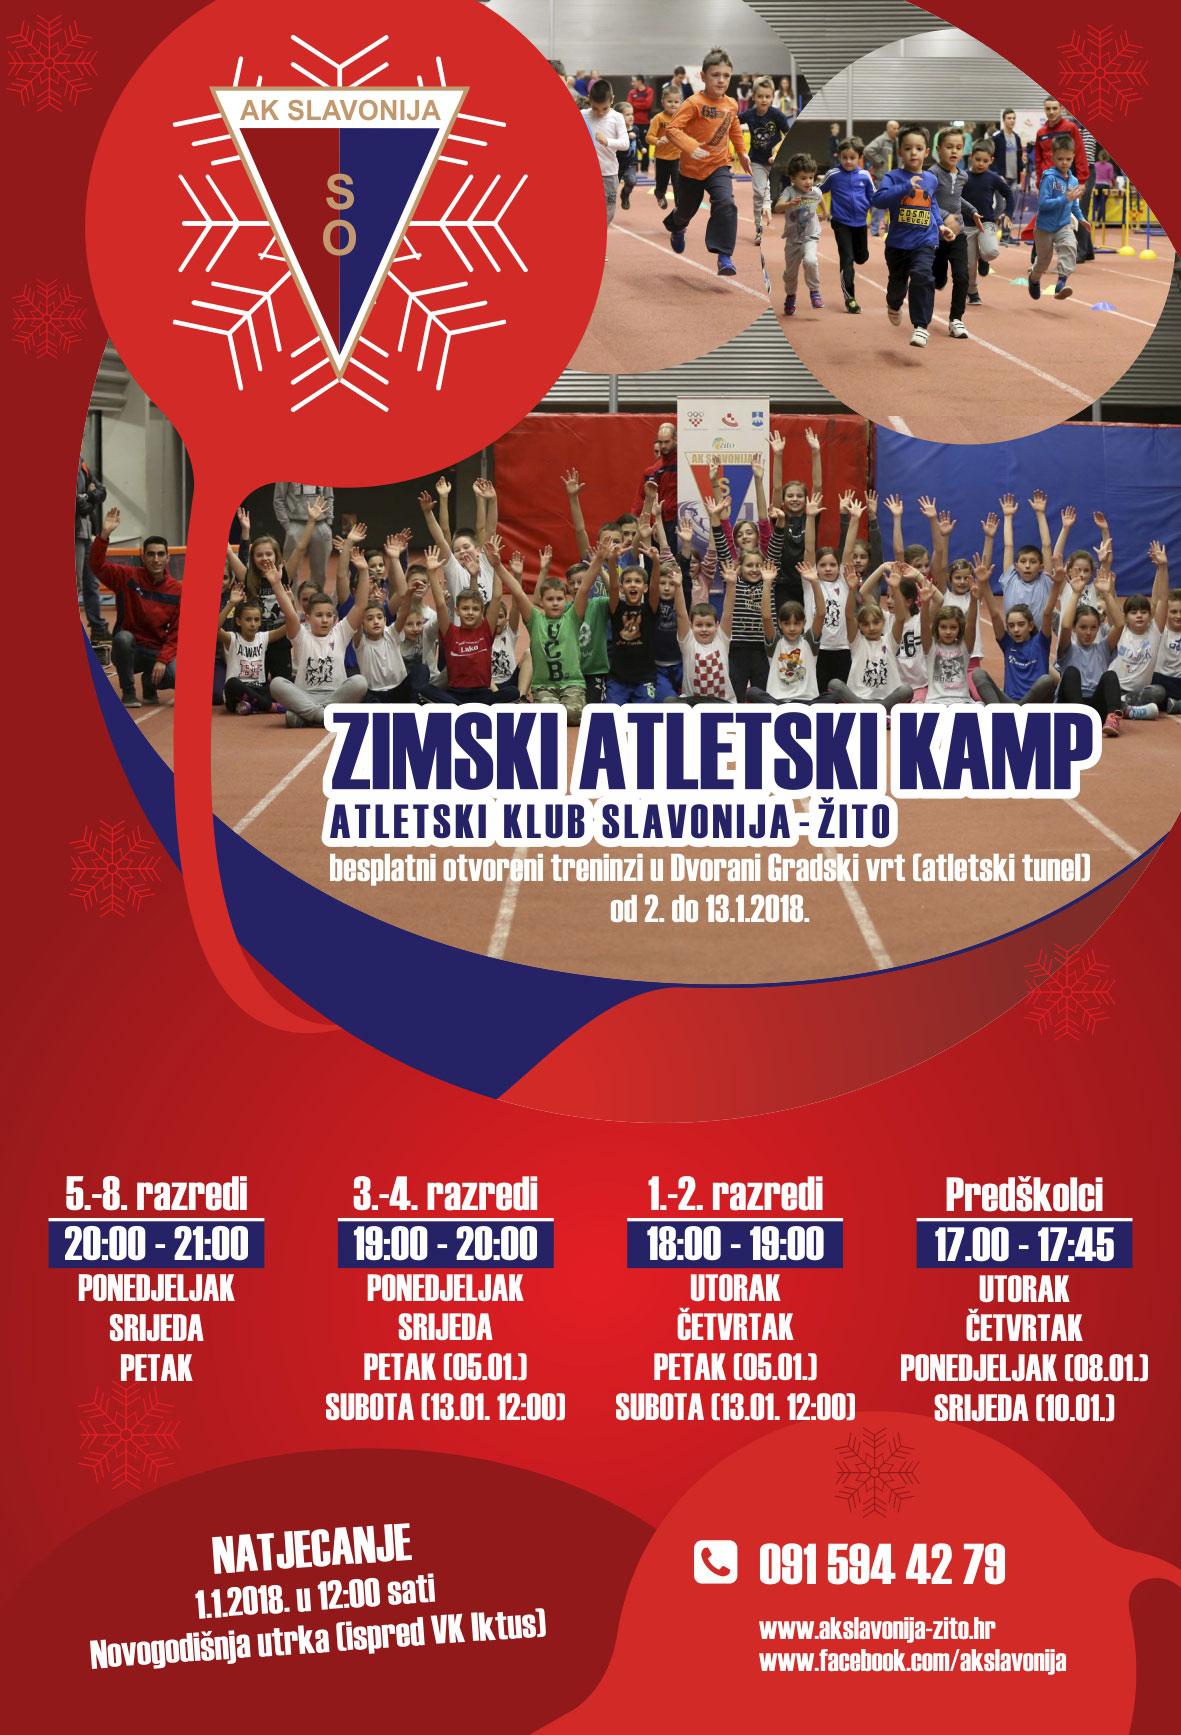 Plakat-Zimski-atletski-kamp-2018